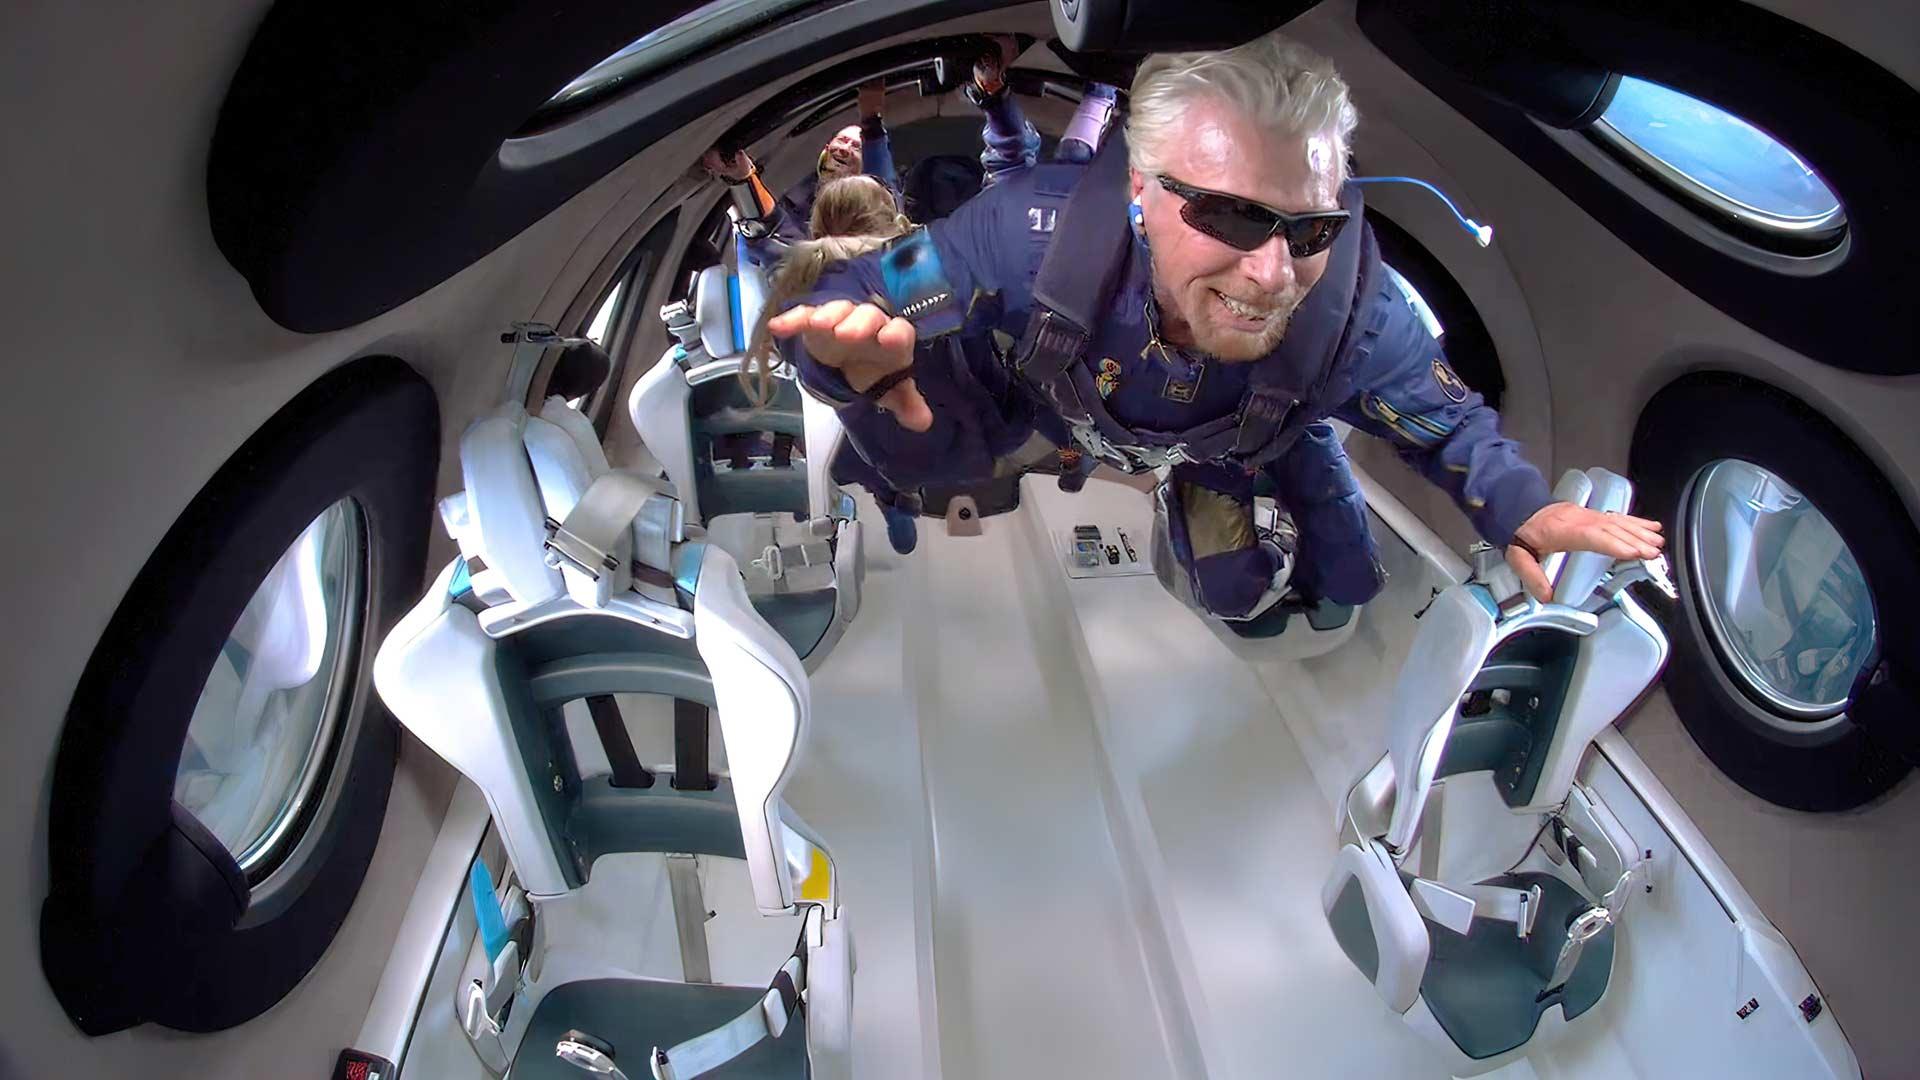 Richard Branson experiences zero-g on board the Unity 22 Virgin Galactic flight. Image: Virgin Galactic